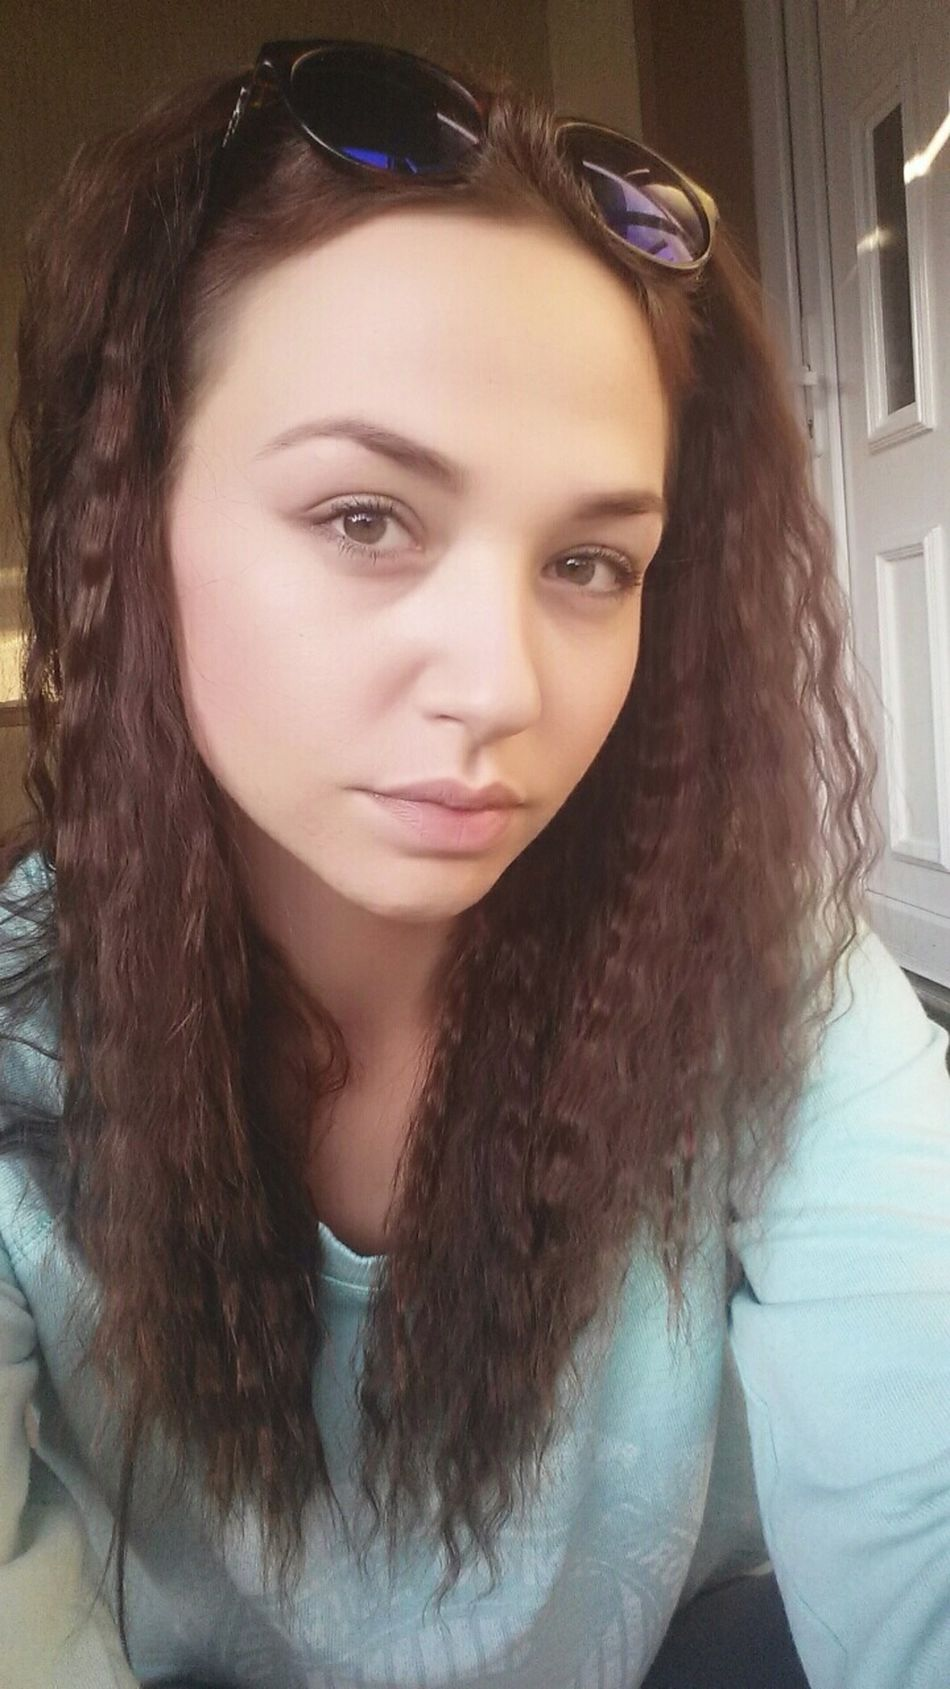 Sun Chilling Nomakeup Natural Look Curlyhairdontcare Mermaidhair Selfie ✌ Faces Of EyeEm Hairstyle Browgame